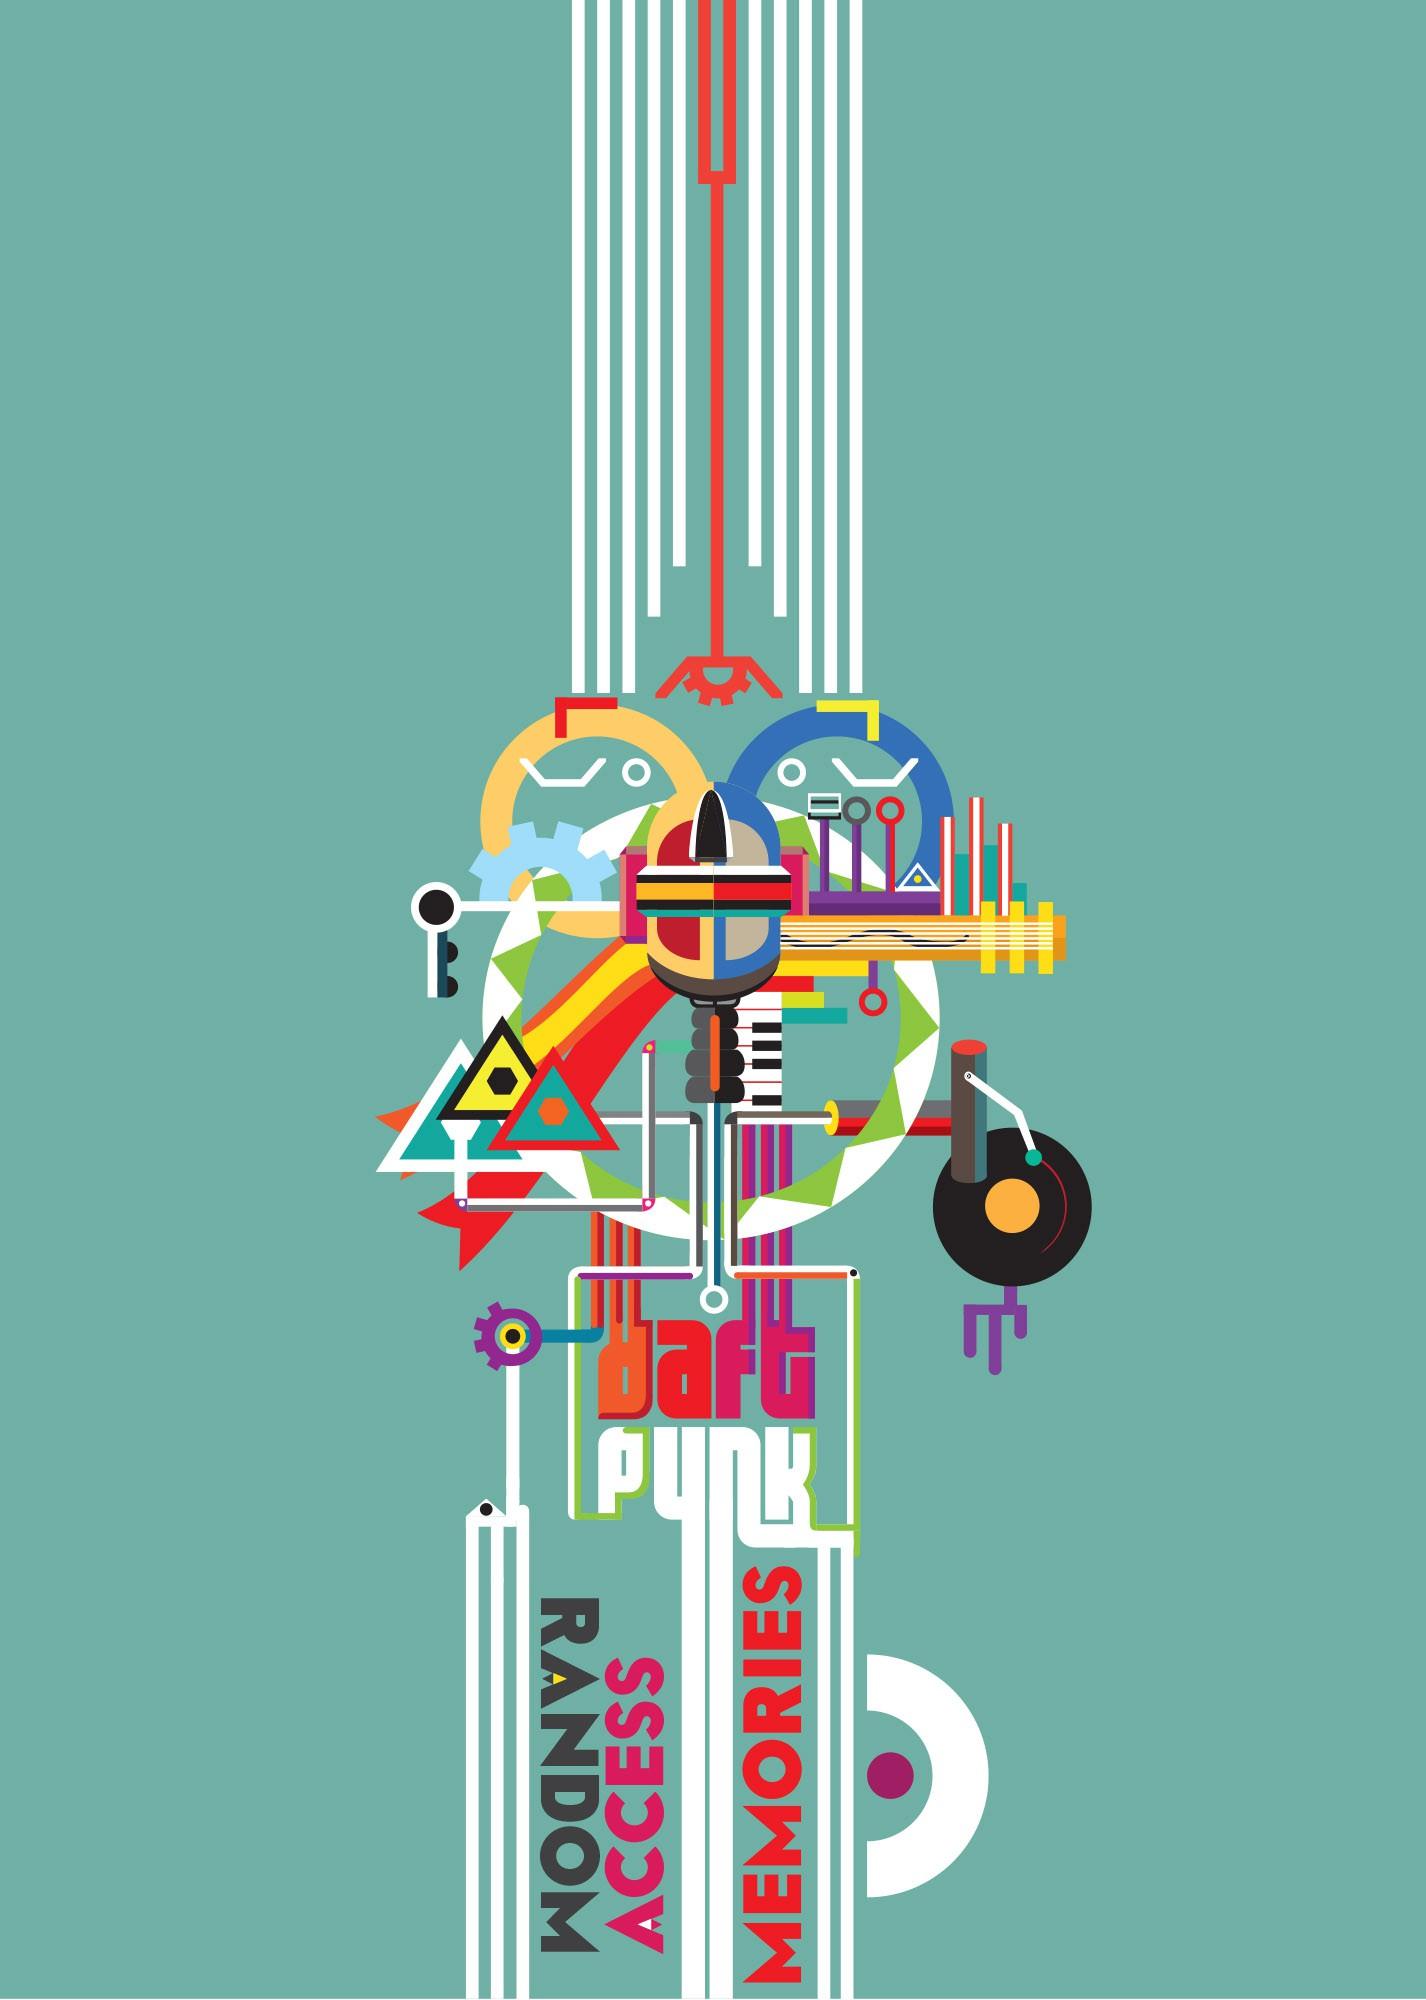 99designs community contest: create a Daft Punk concert poster